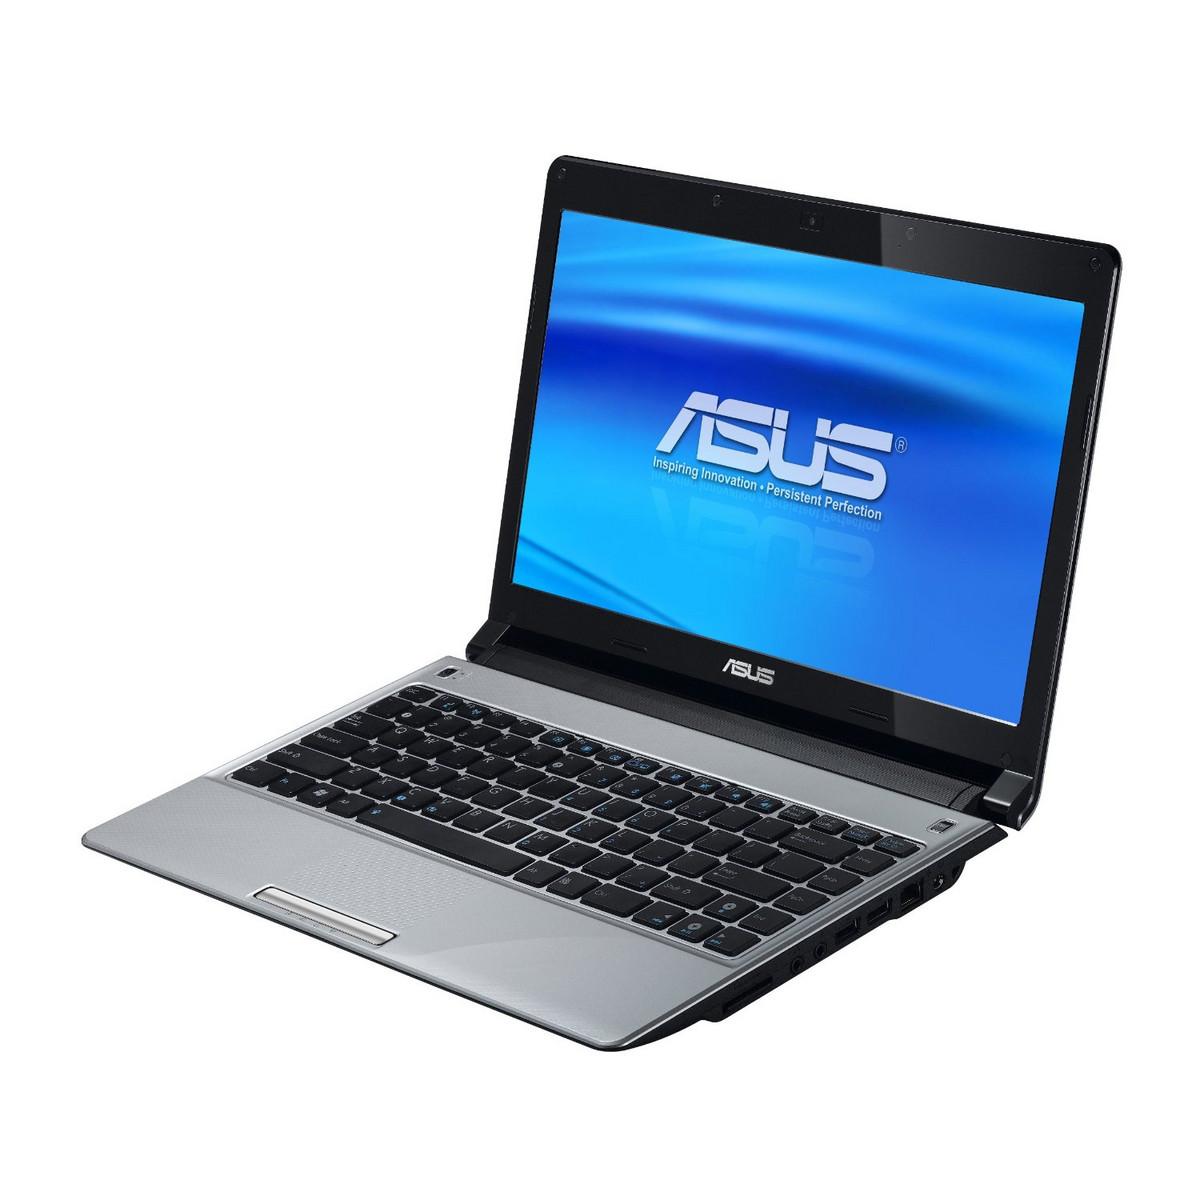 ASUS UL30Jt NVIDIA Graphics X64 Driver Download